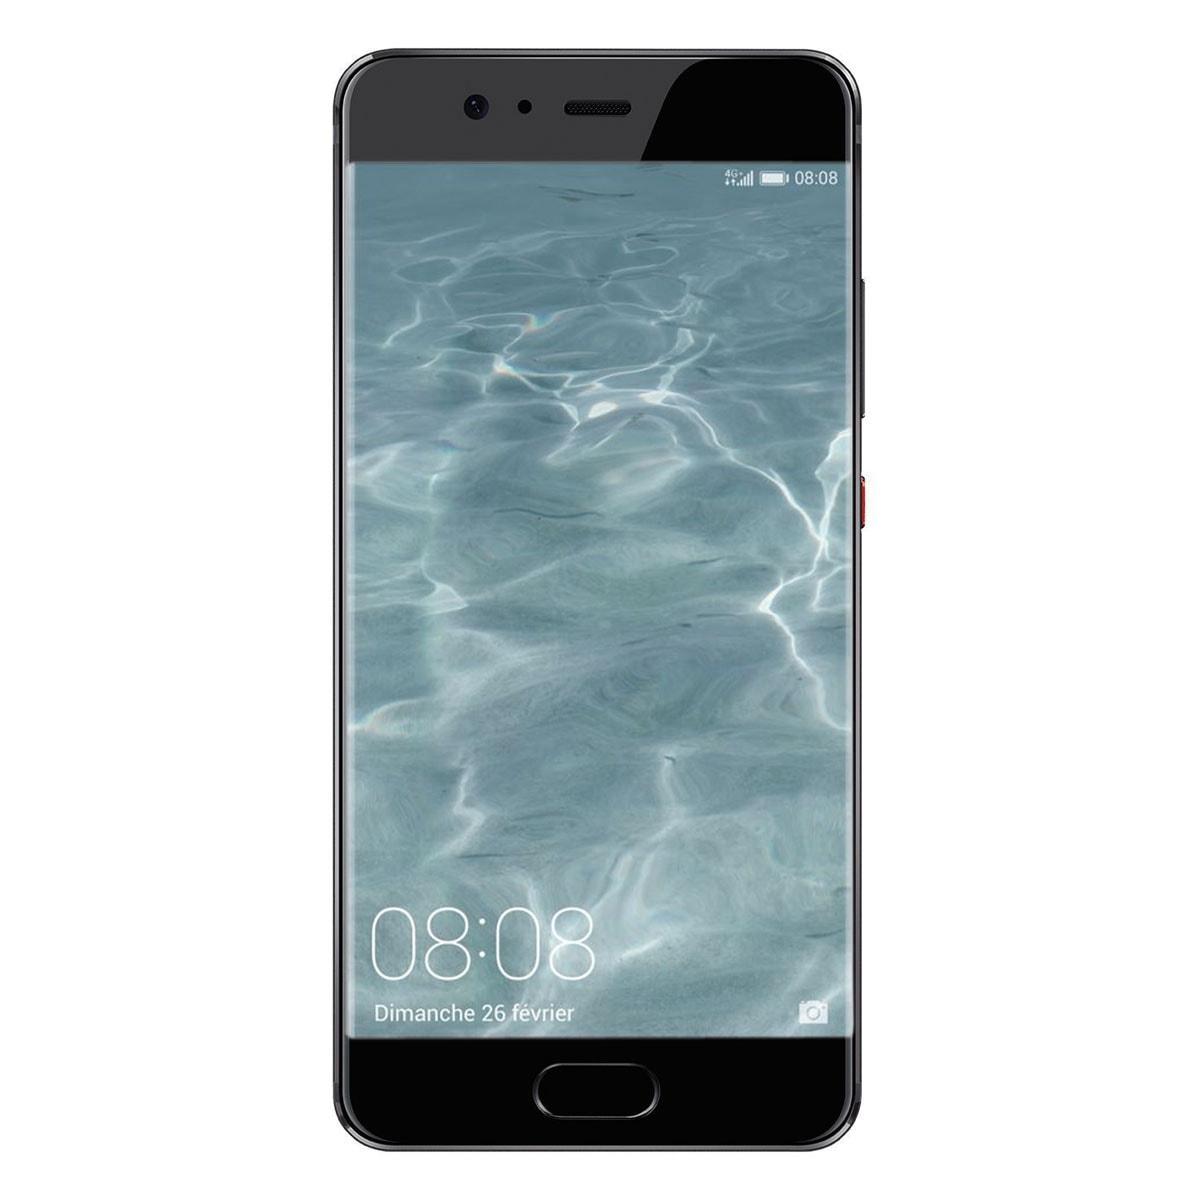 Huawei Téléphonie Huawei P10 64Go Black (51091FGC) - Achat / Vente Téléphonie sur Cybertek.fr - 0